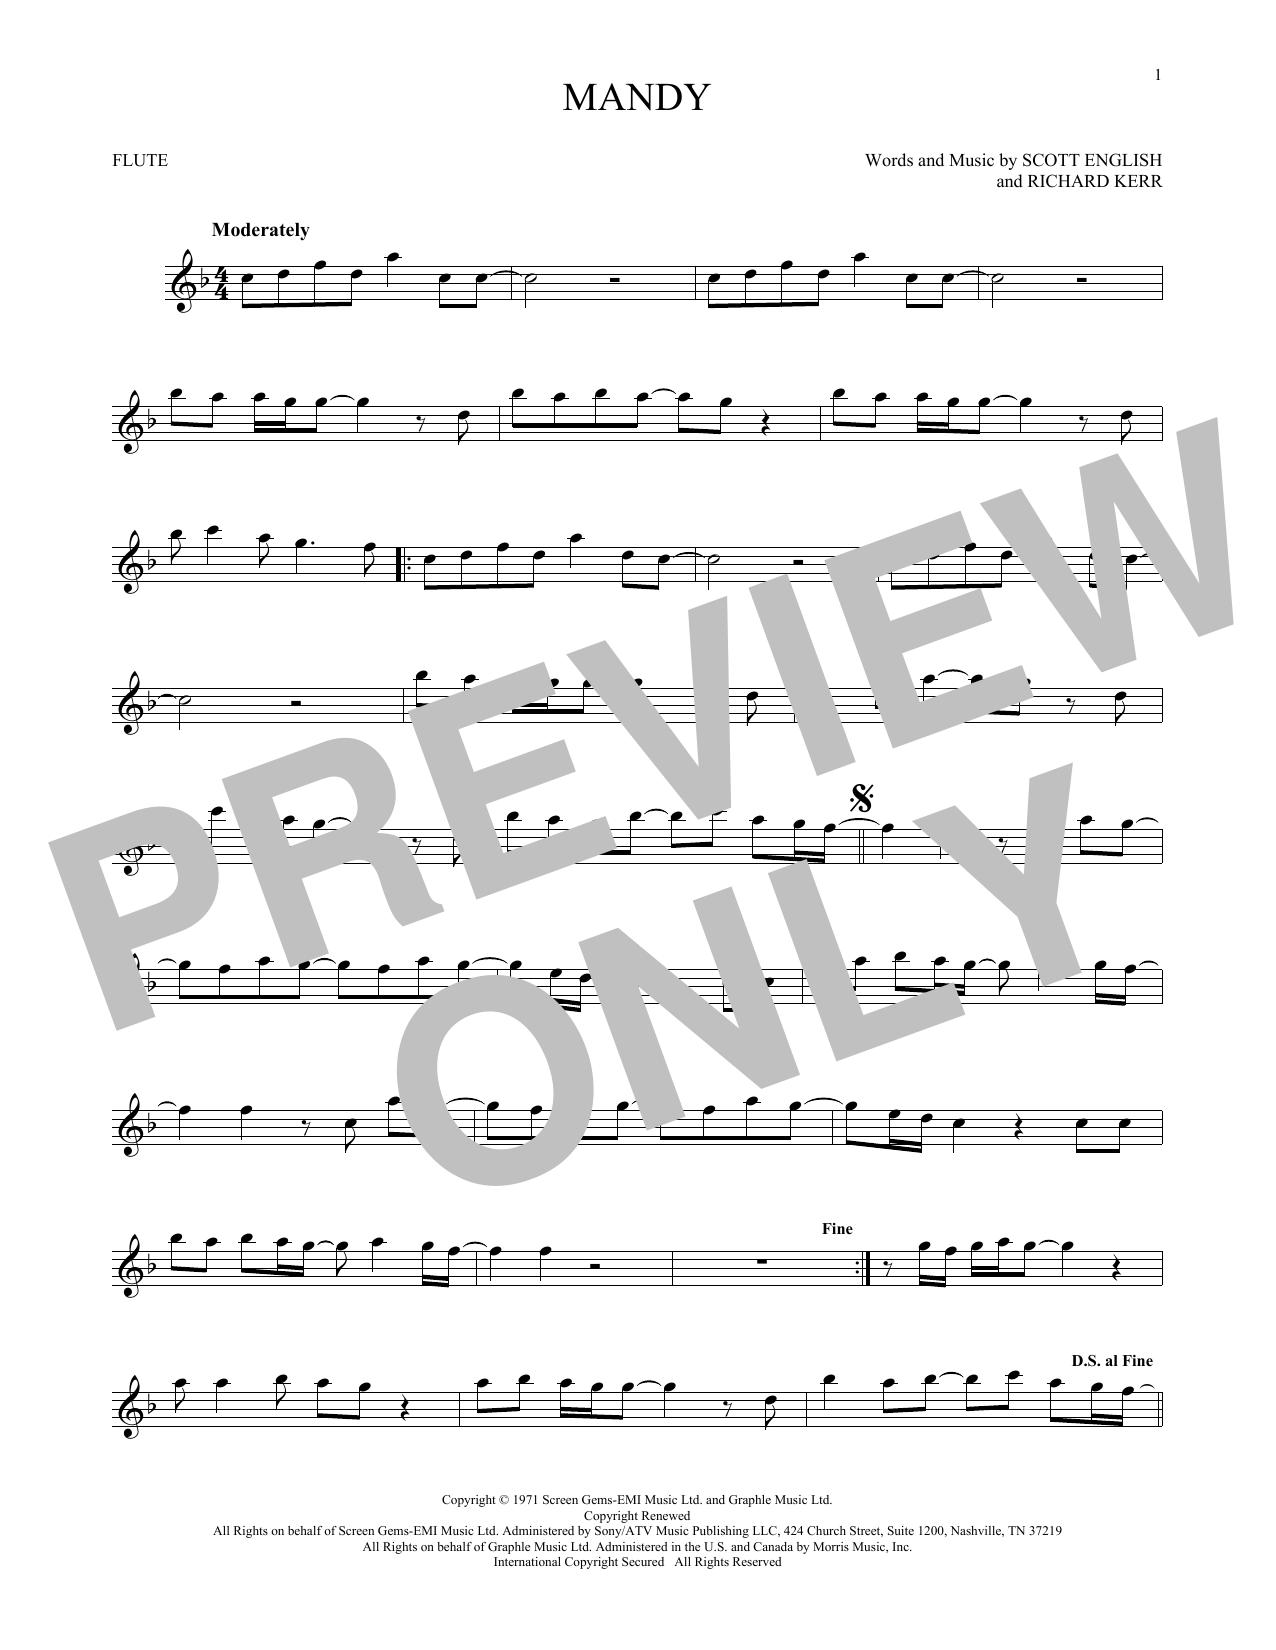 Mandy (Flute Solo)